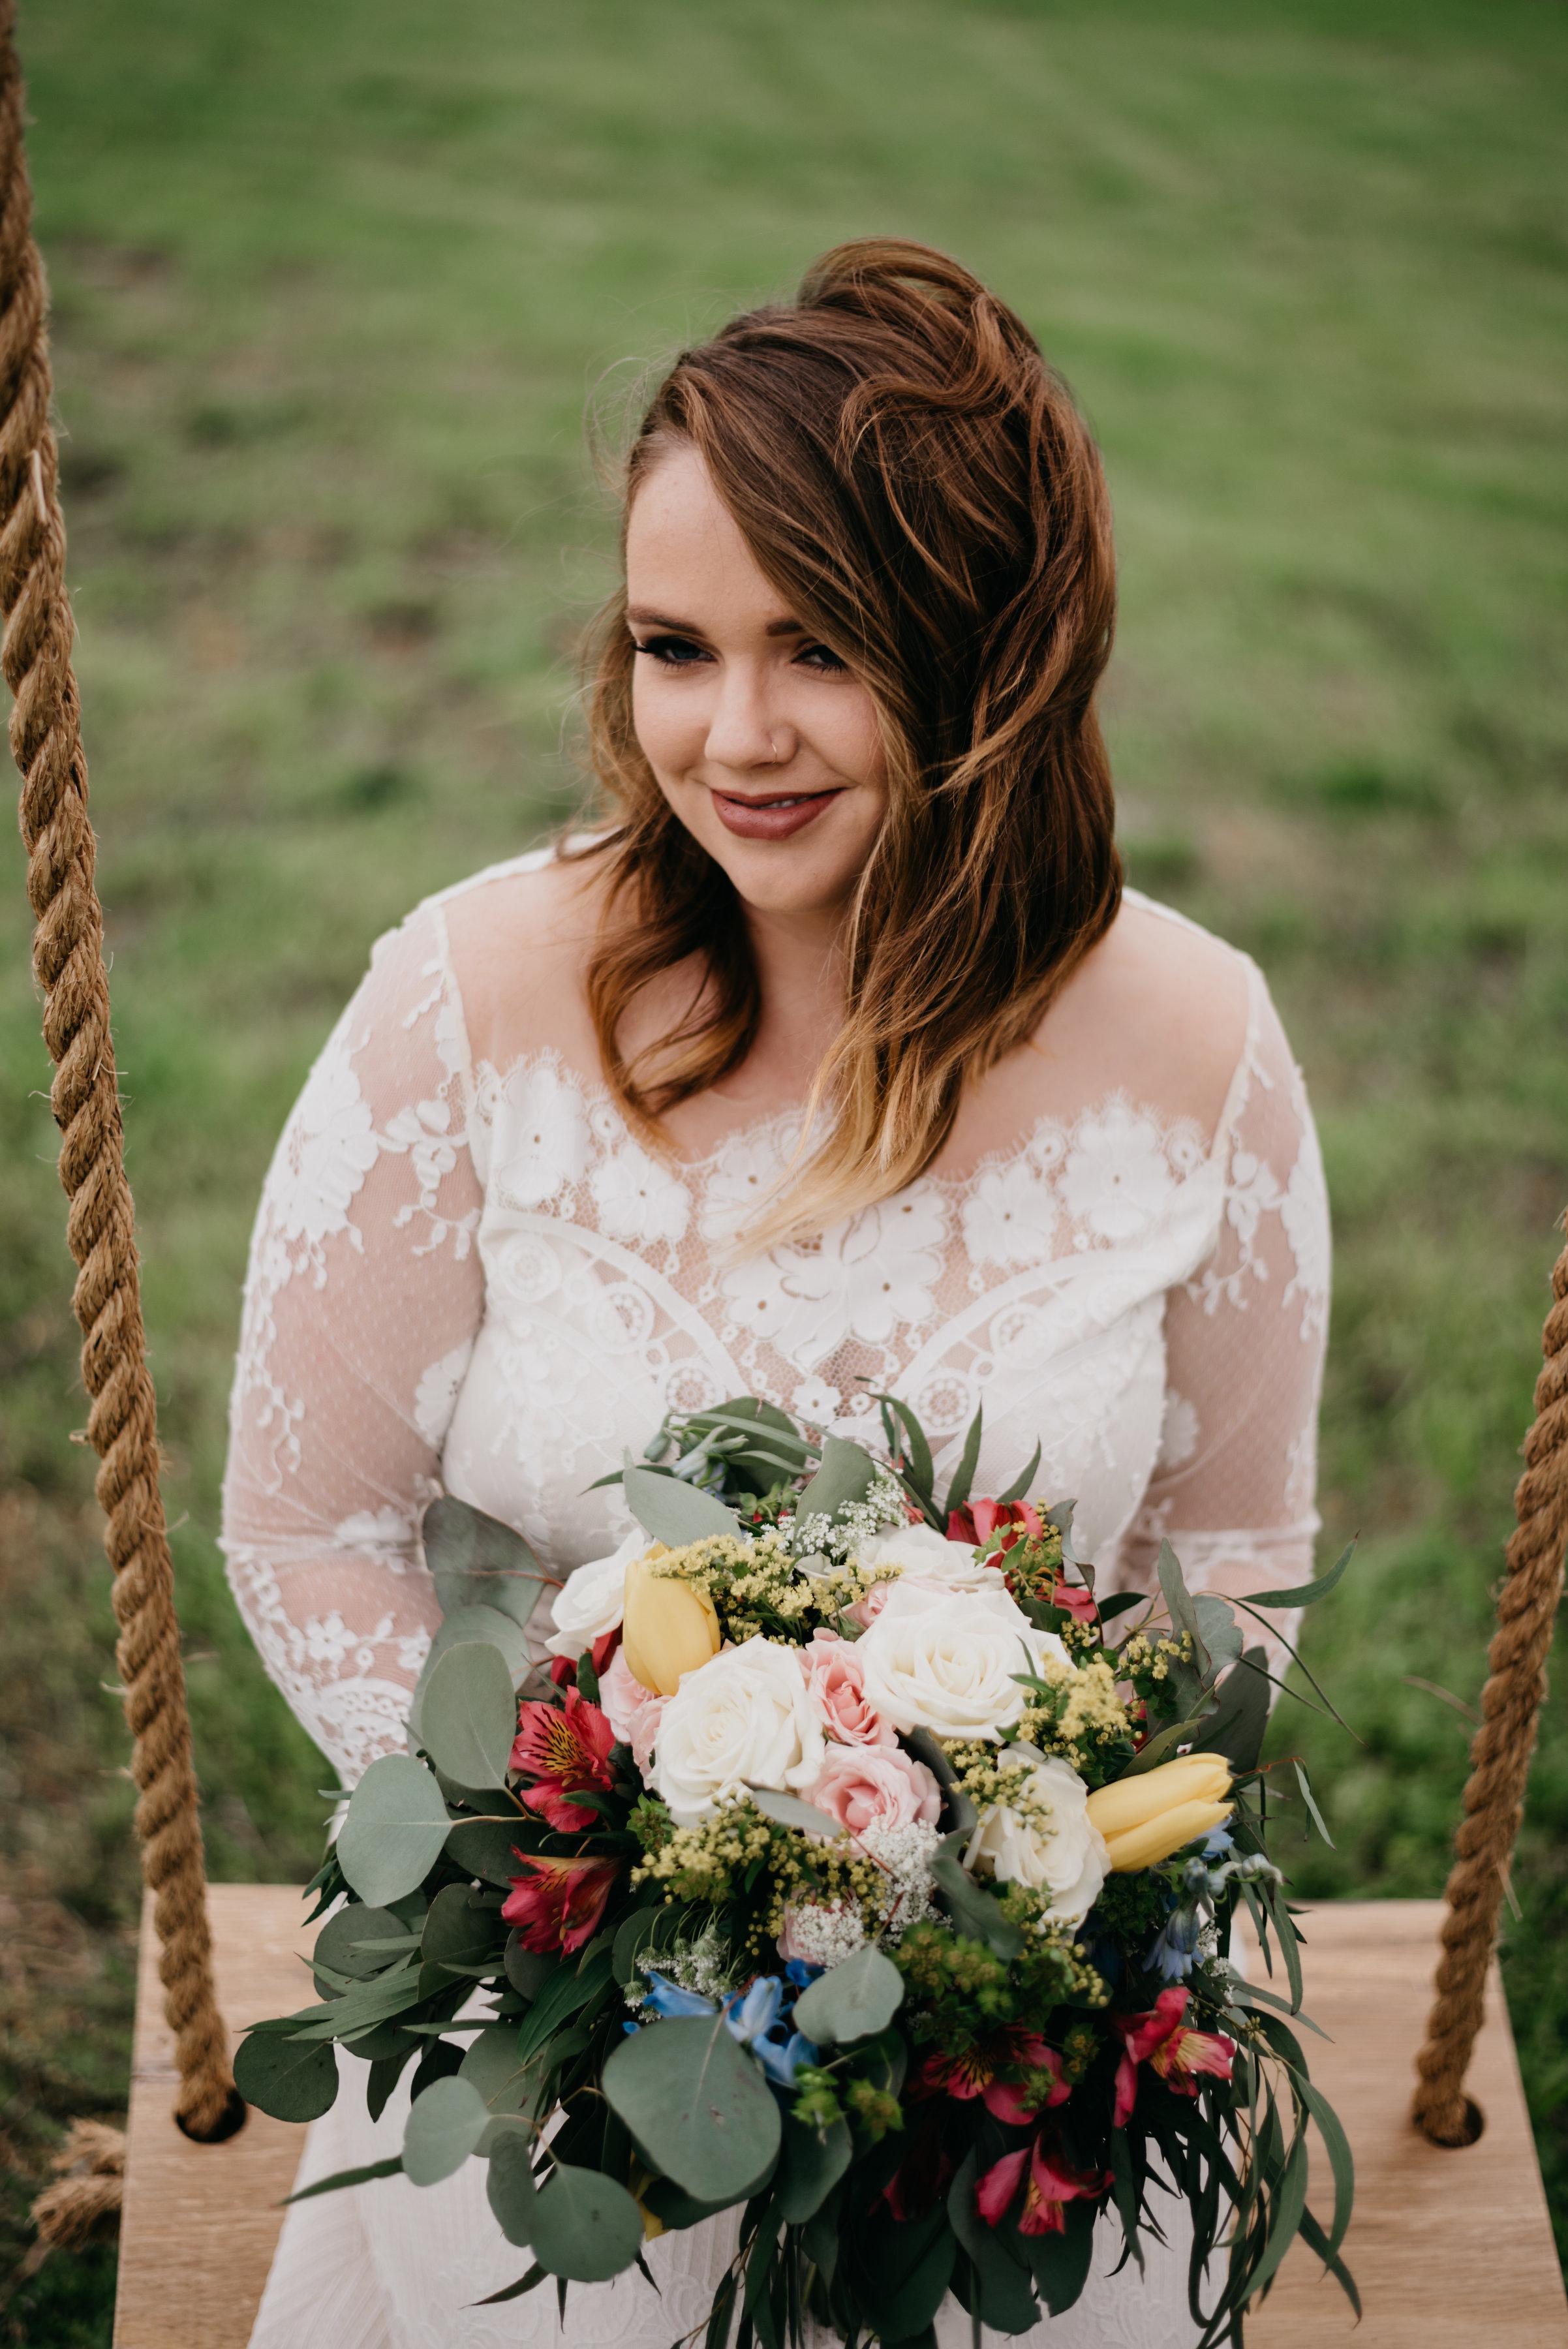 Allenbrooke-Farms-Nashville-Wedding-Photographers 49.jpg